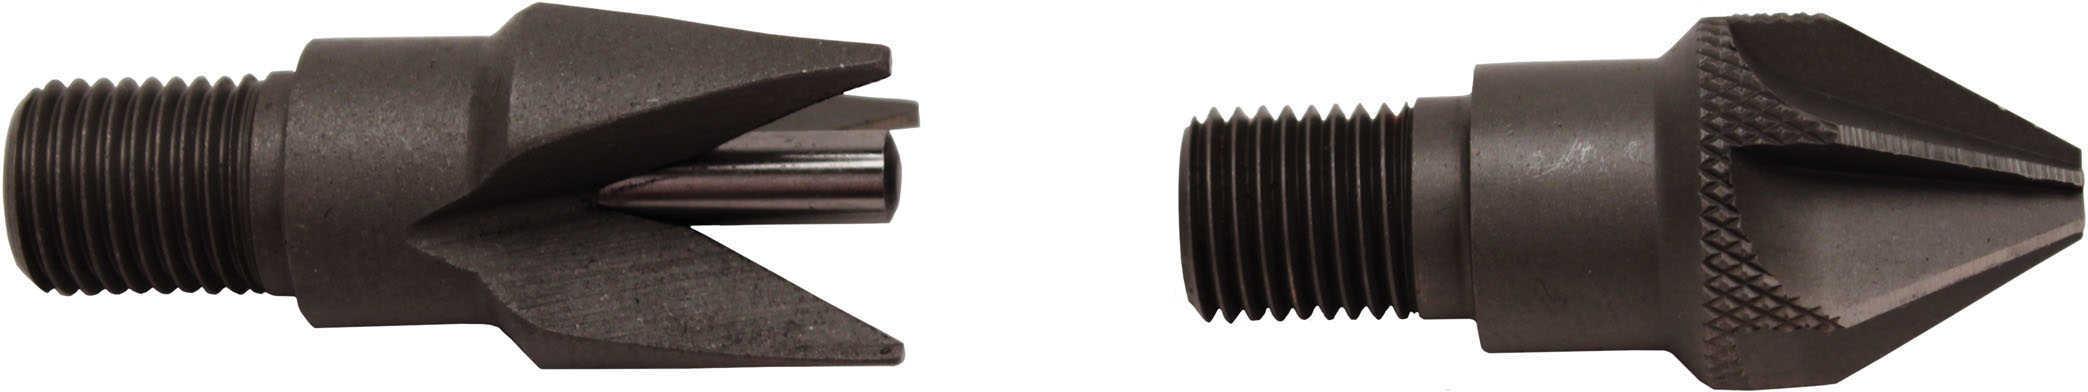 Hornady Trimmer Deburr Tool Md: 050147